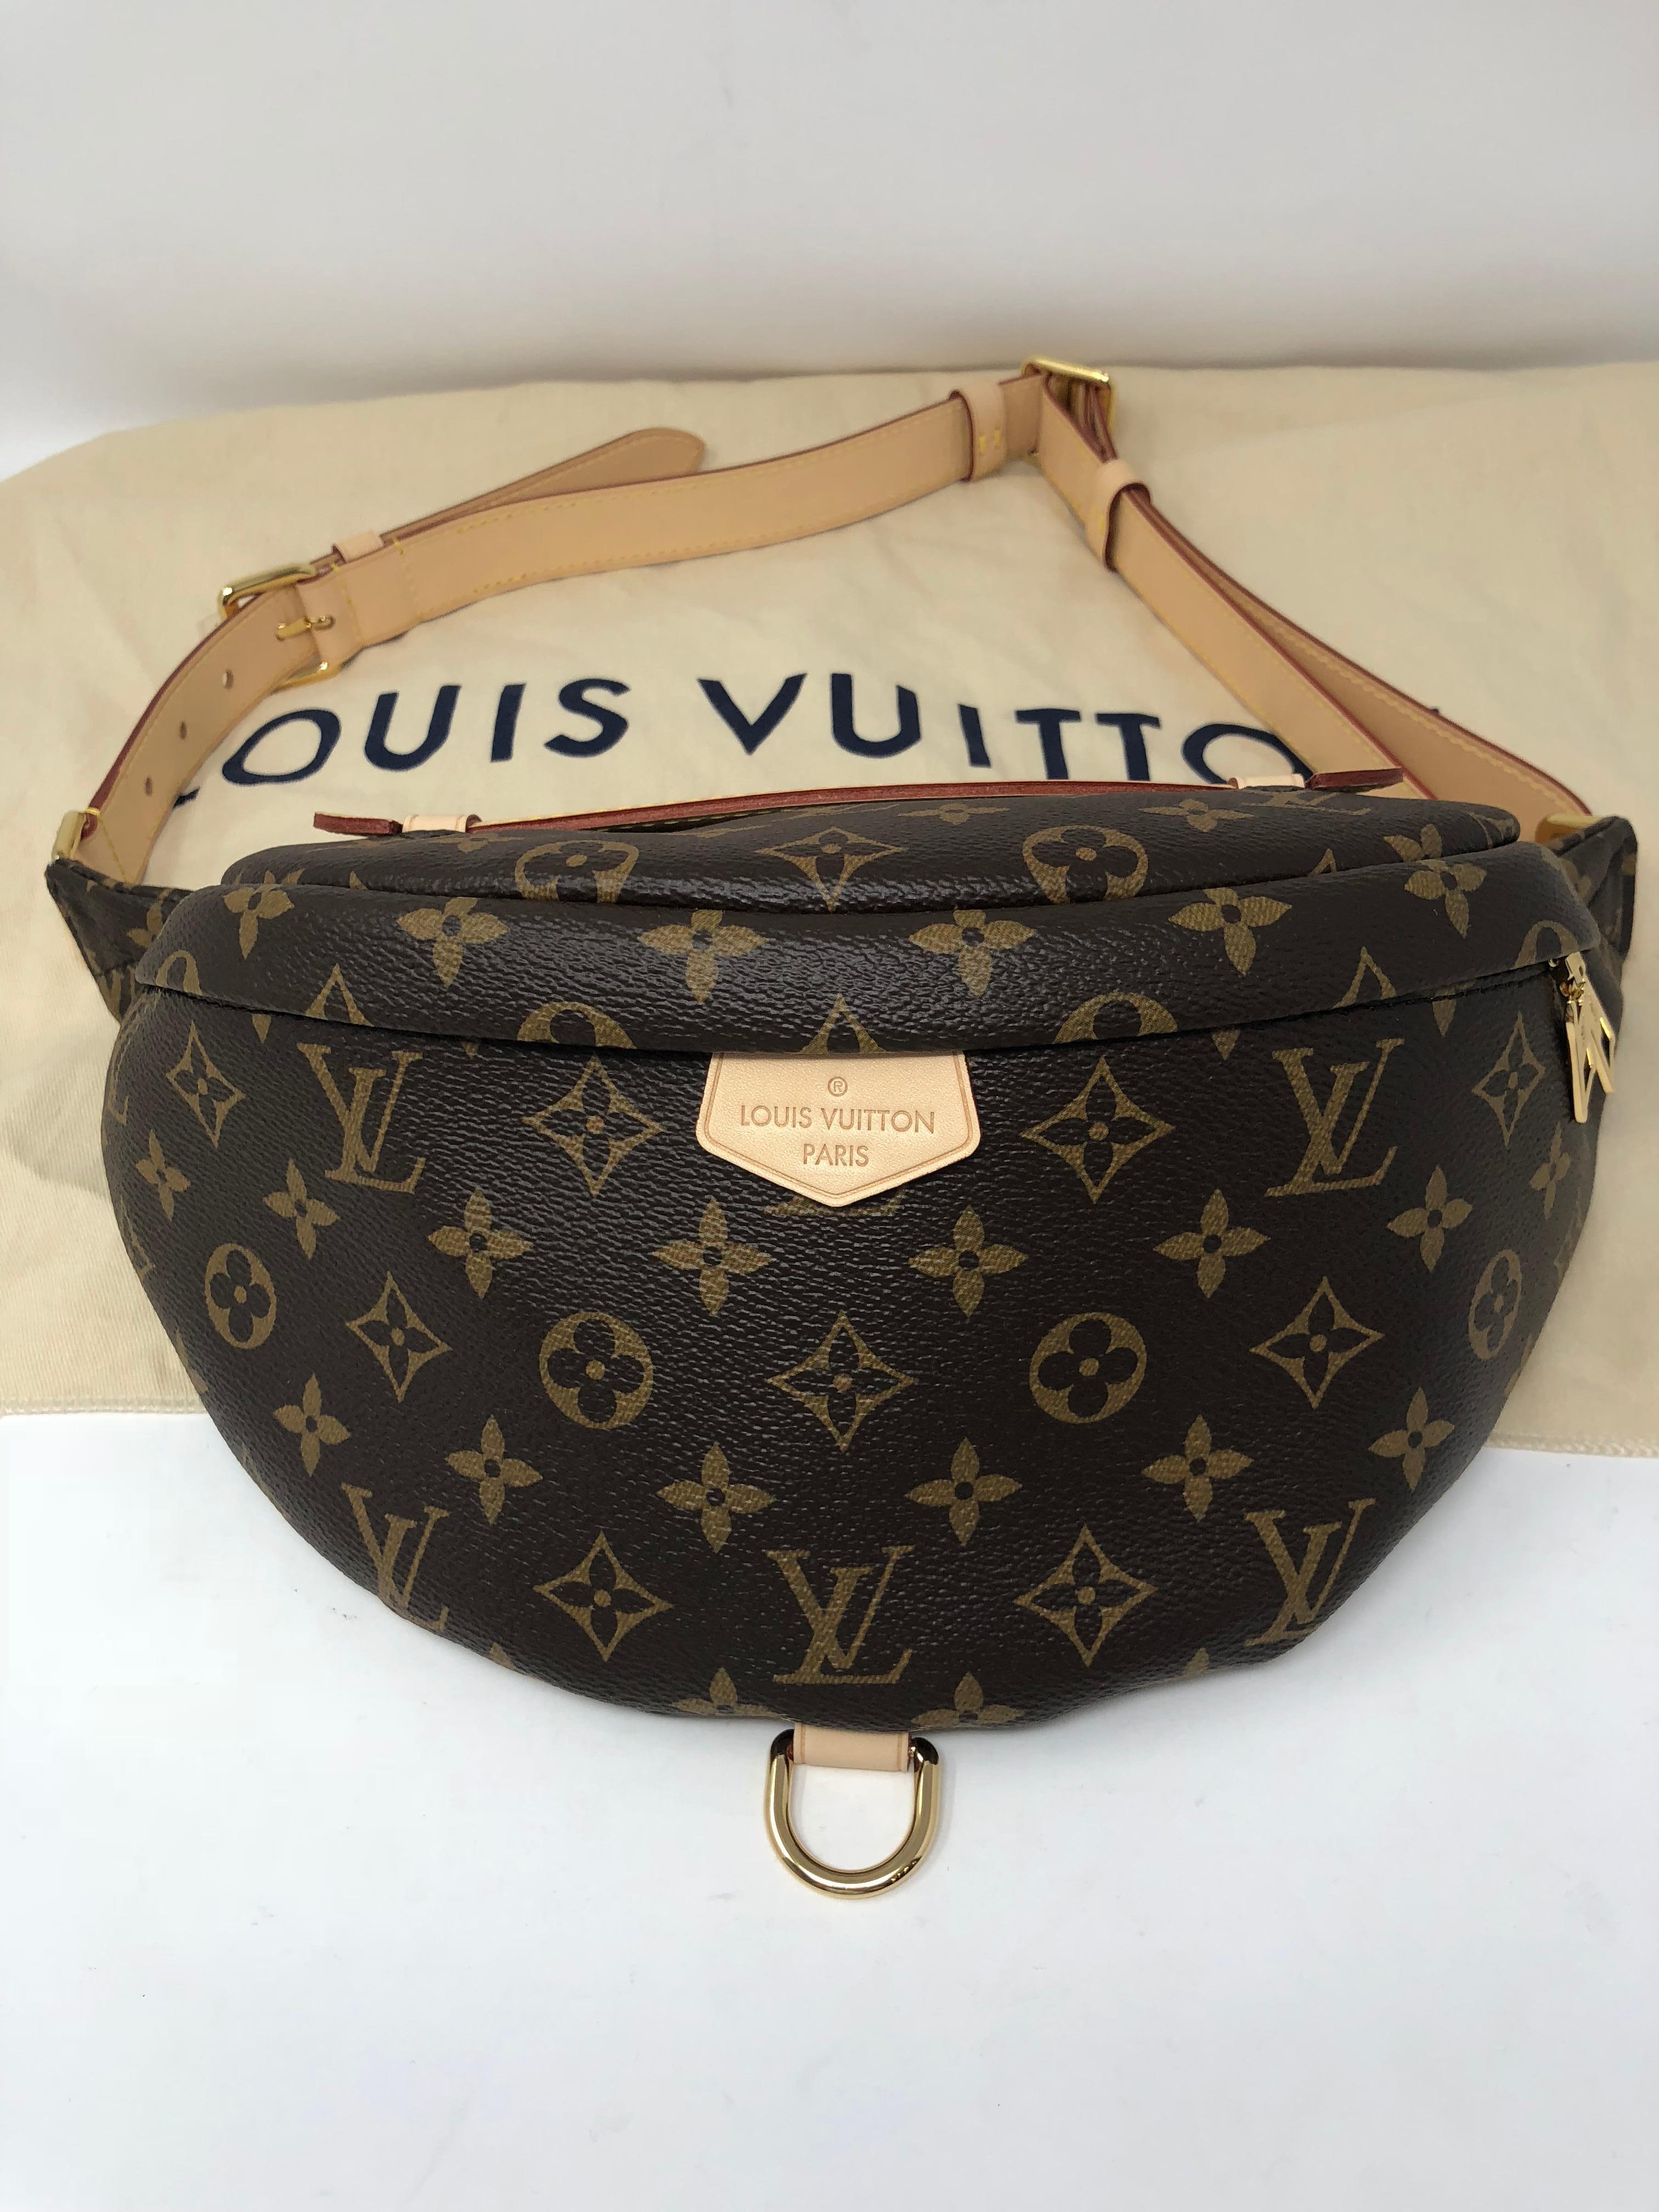 75d05c7ec0373 Louis Vuitton Bum Tasche im Angebot bei 1stdibs